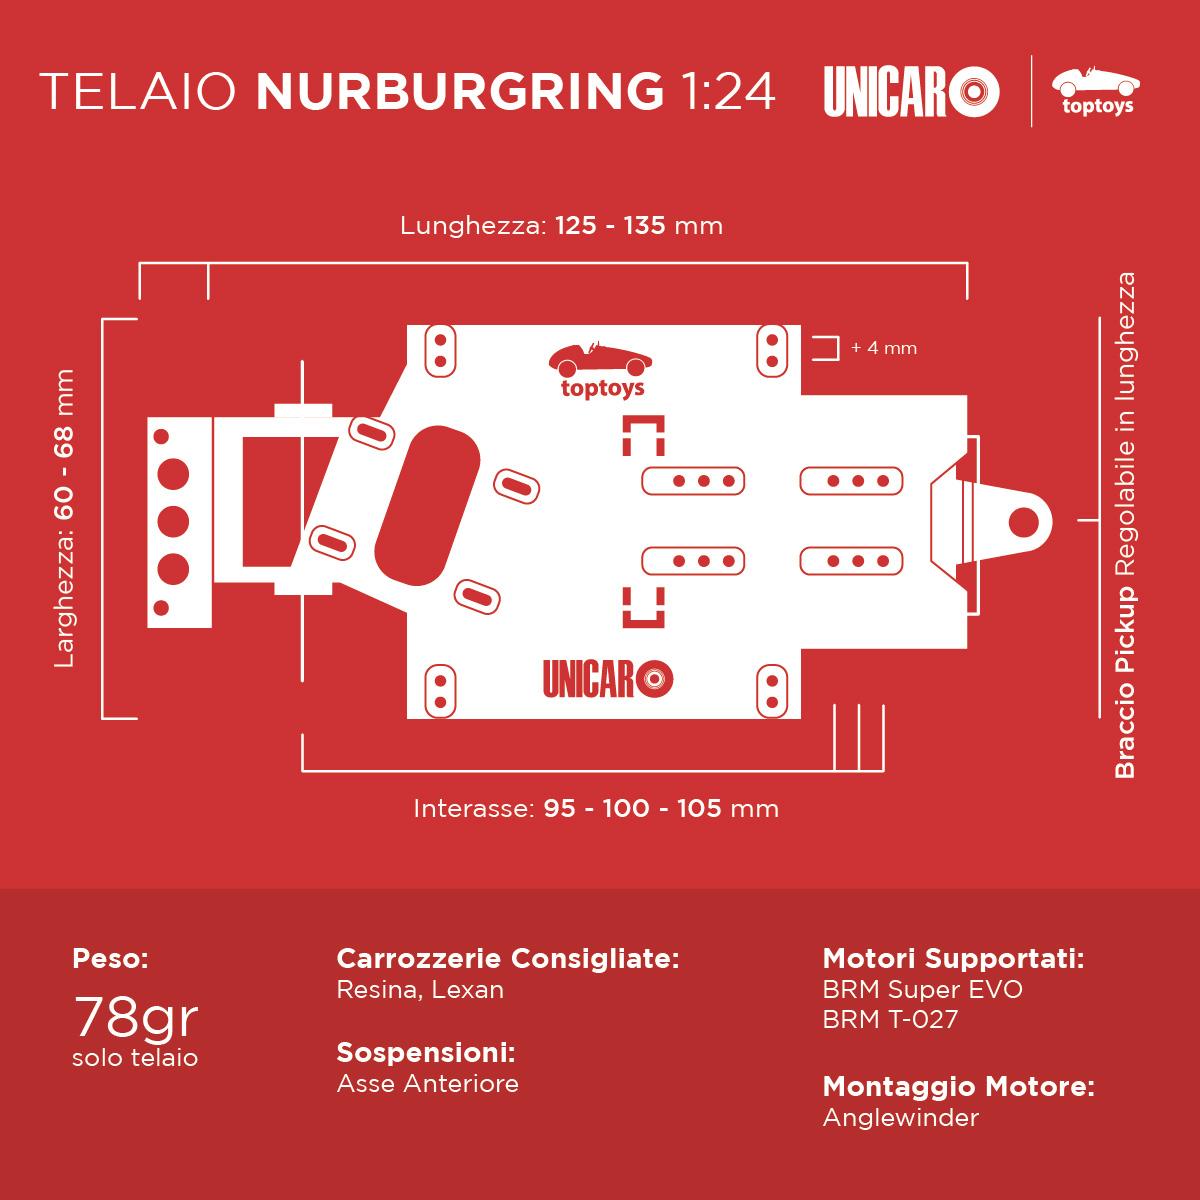 https://www.orlandinifrancesco.com/wp/wp-content/uploads/2019/06/Scheda-Tecnica-Telaio-Nurburgring.jpg